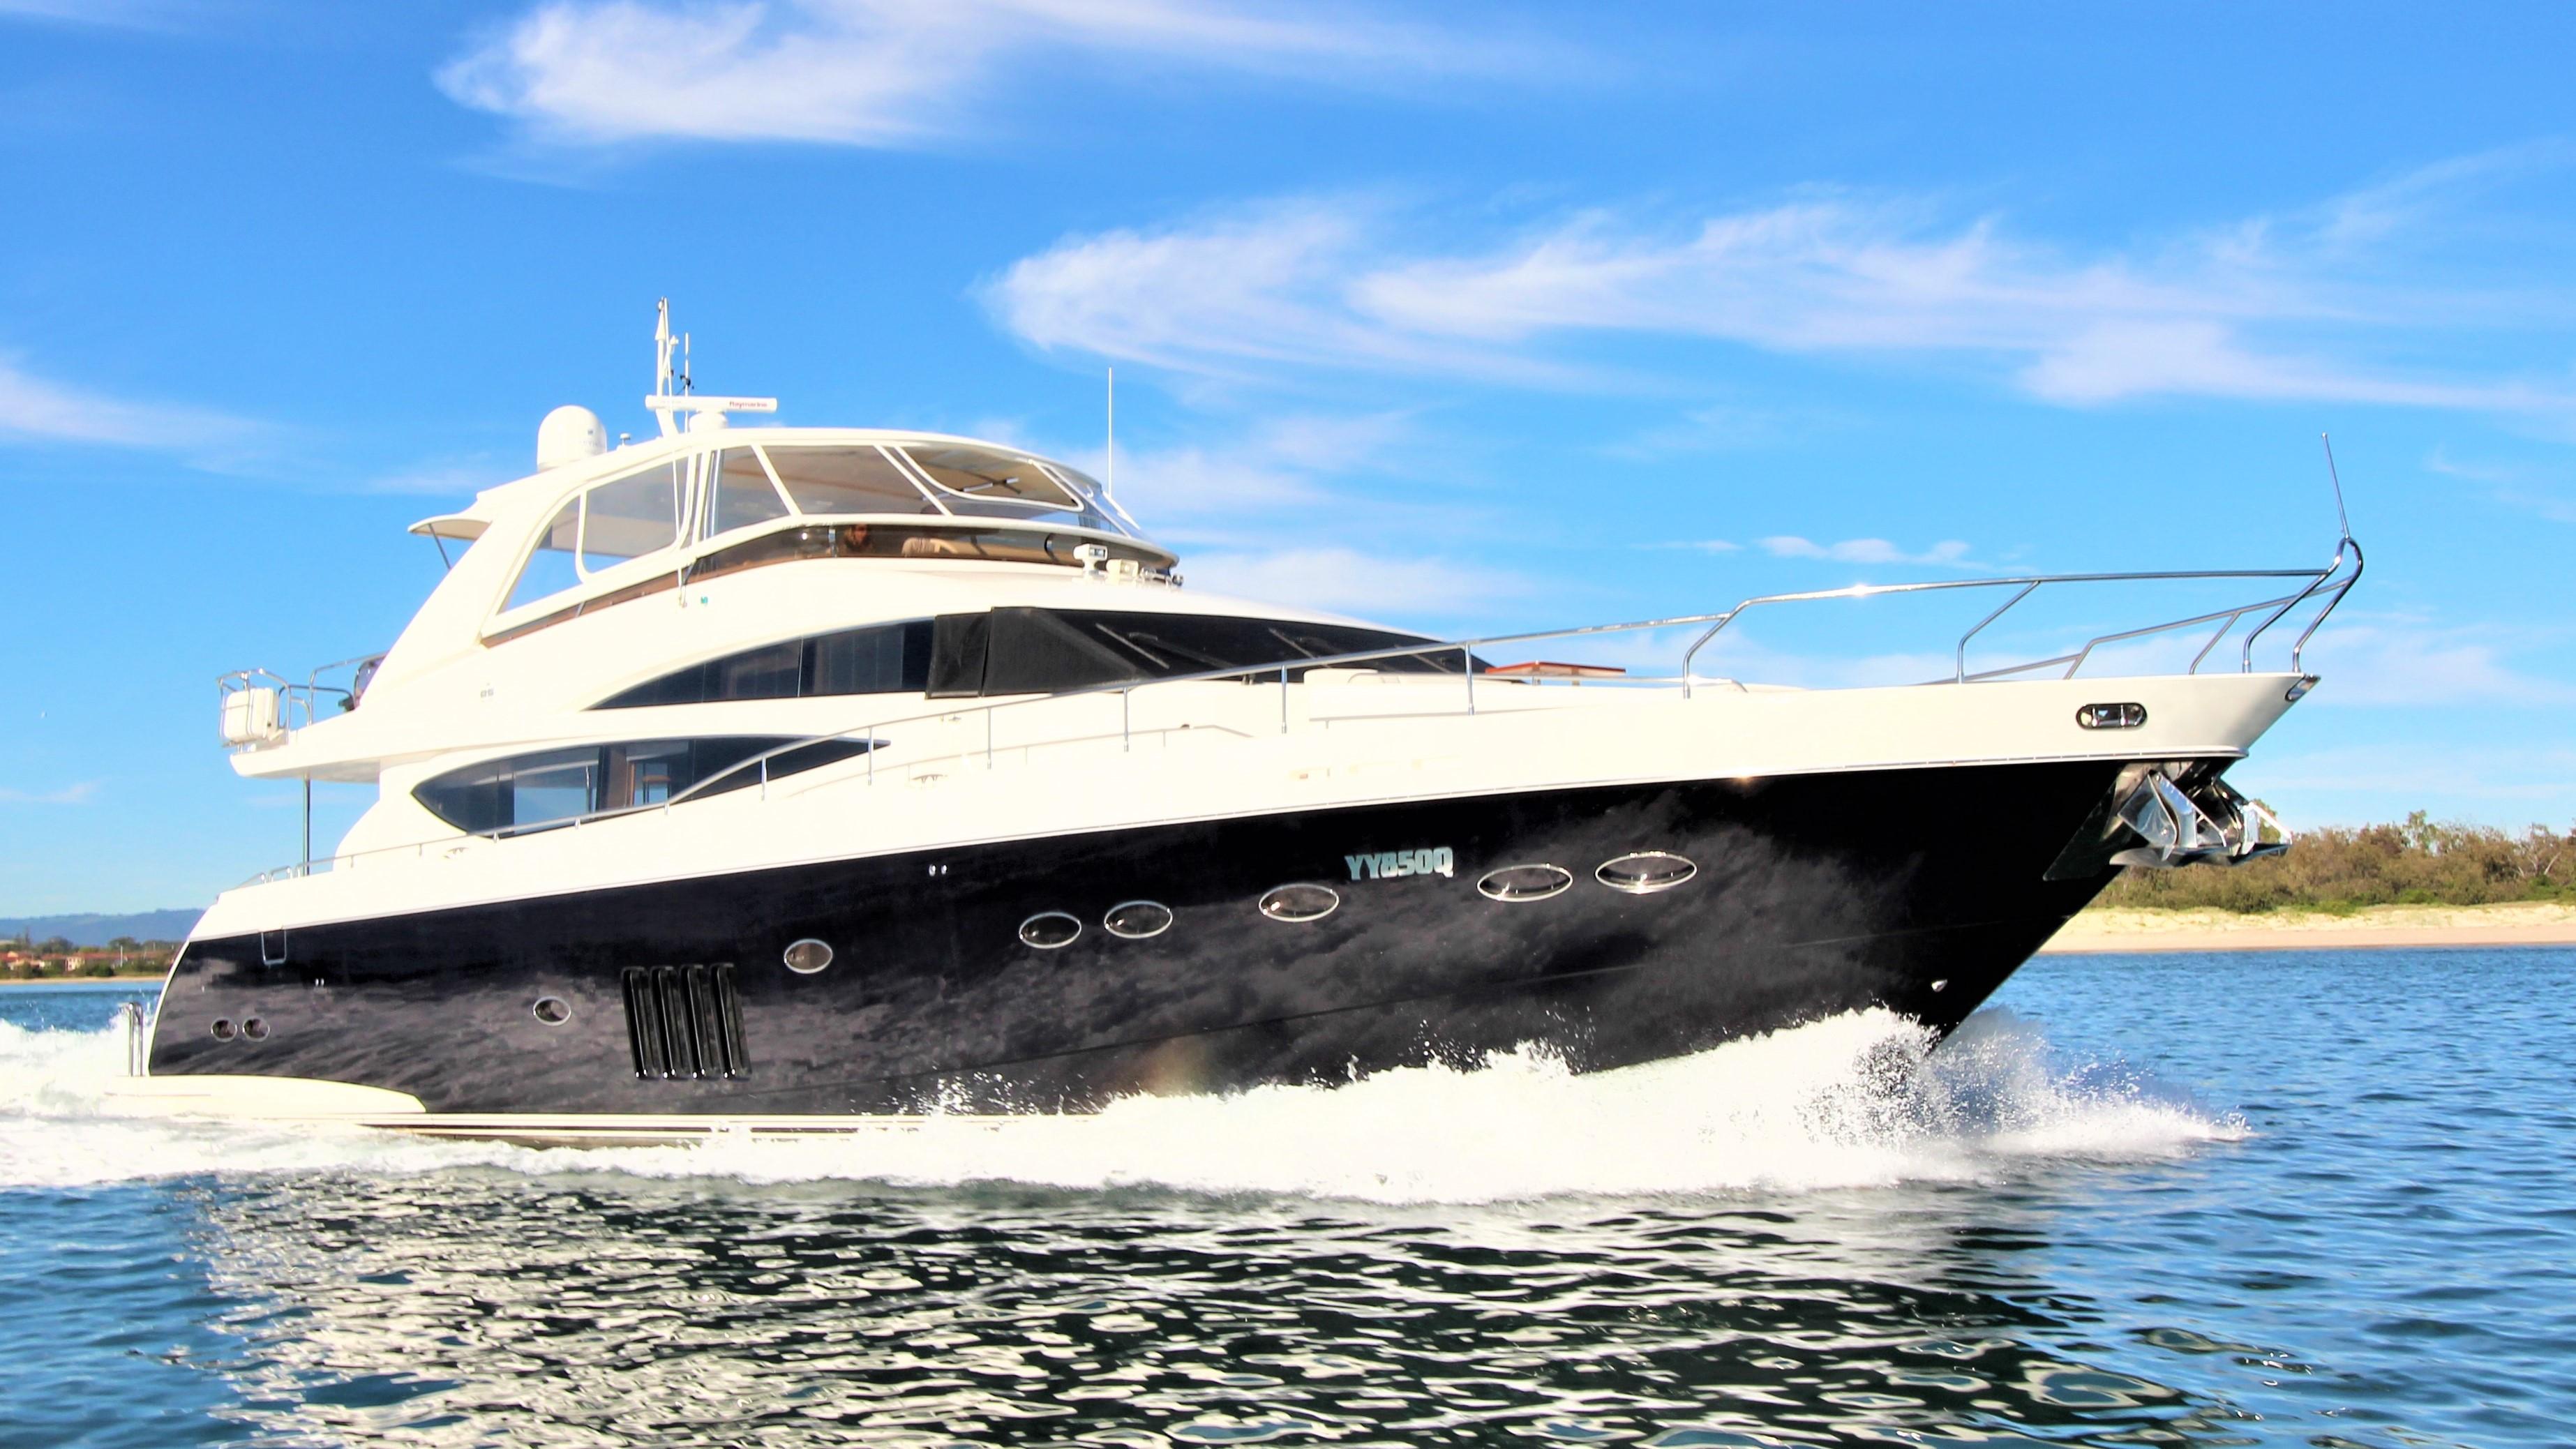 85 Princess Yacht Aqua Yachtsmen International